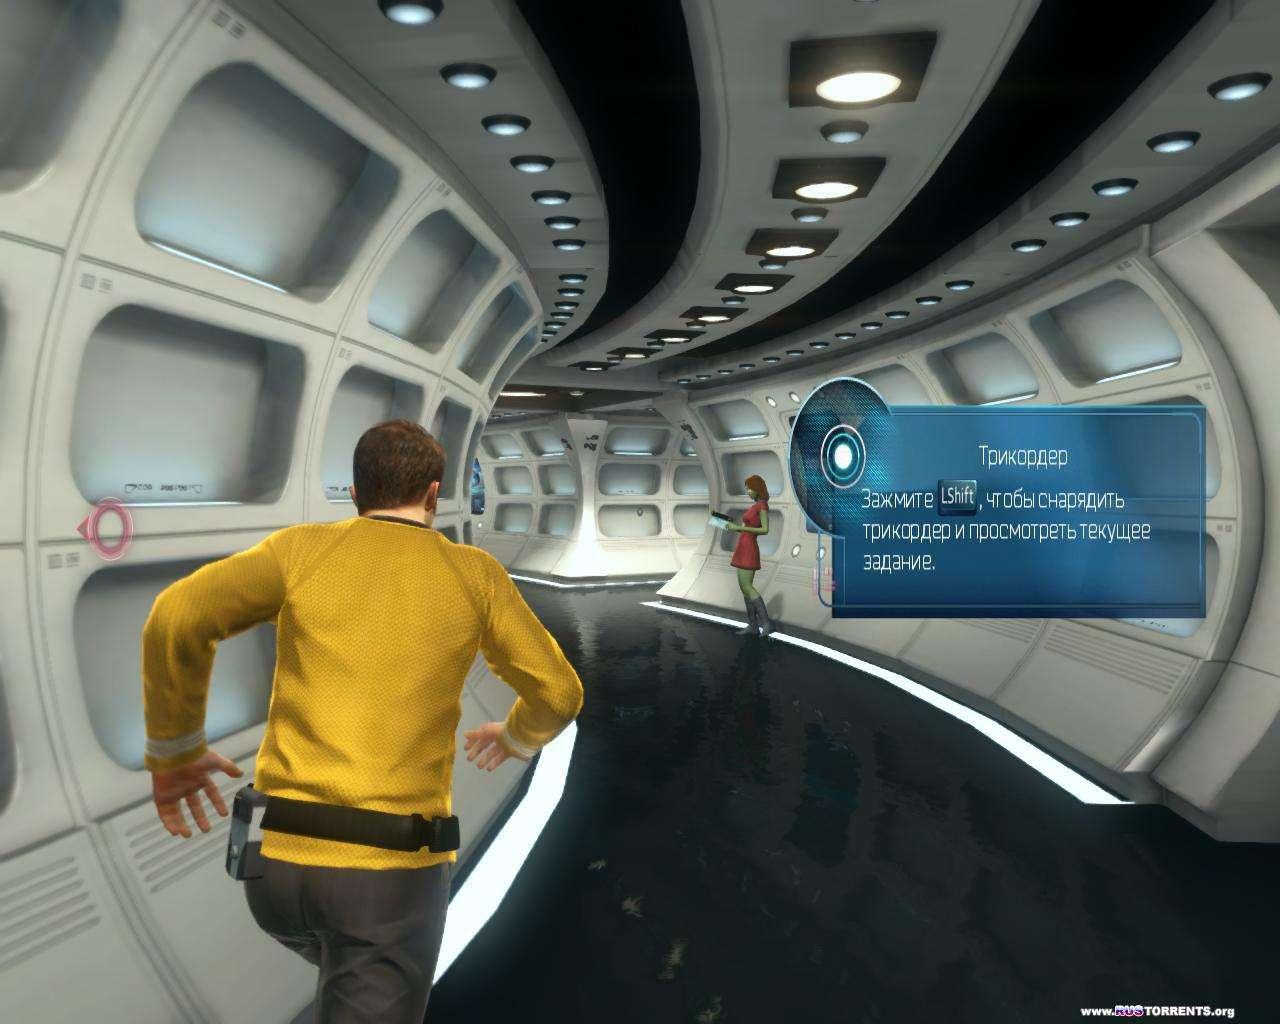 Star Trek (Namco Bandai Games) (RUS|ENG) [RePack] �� SEYTER